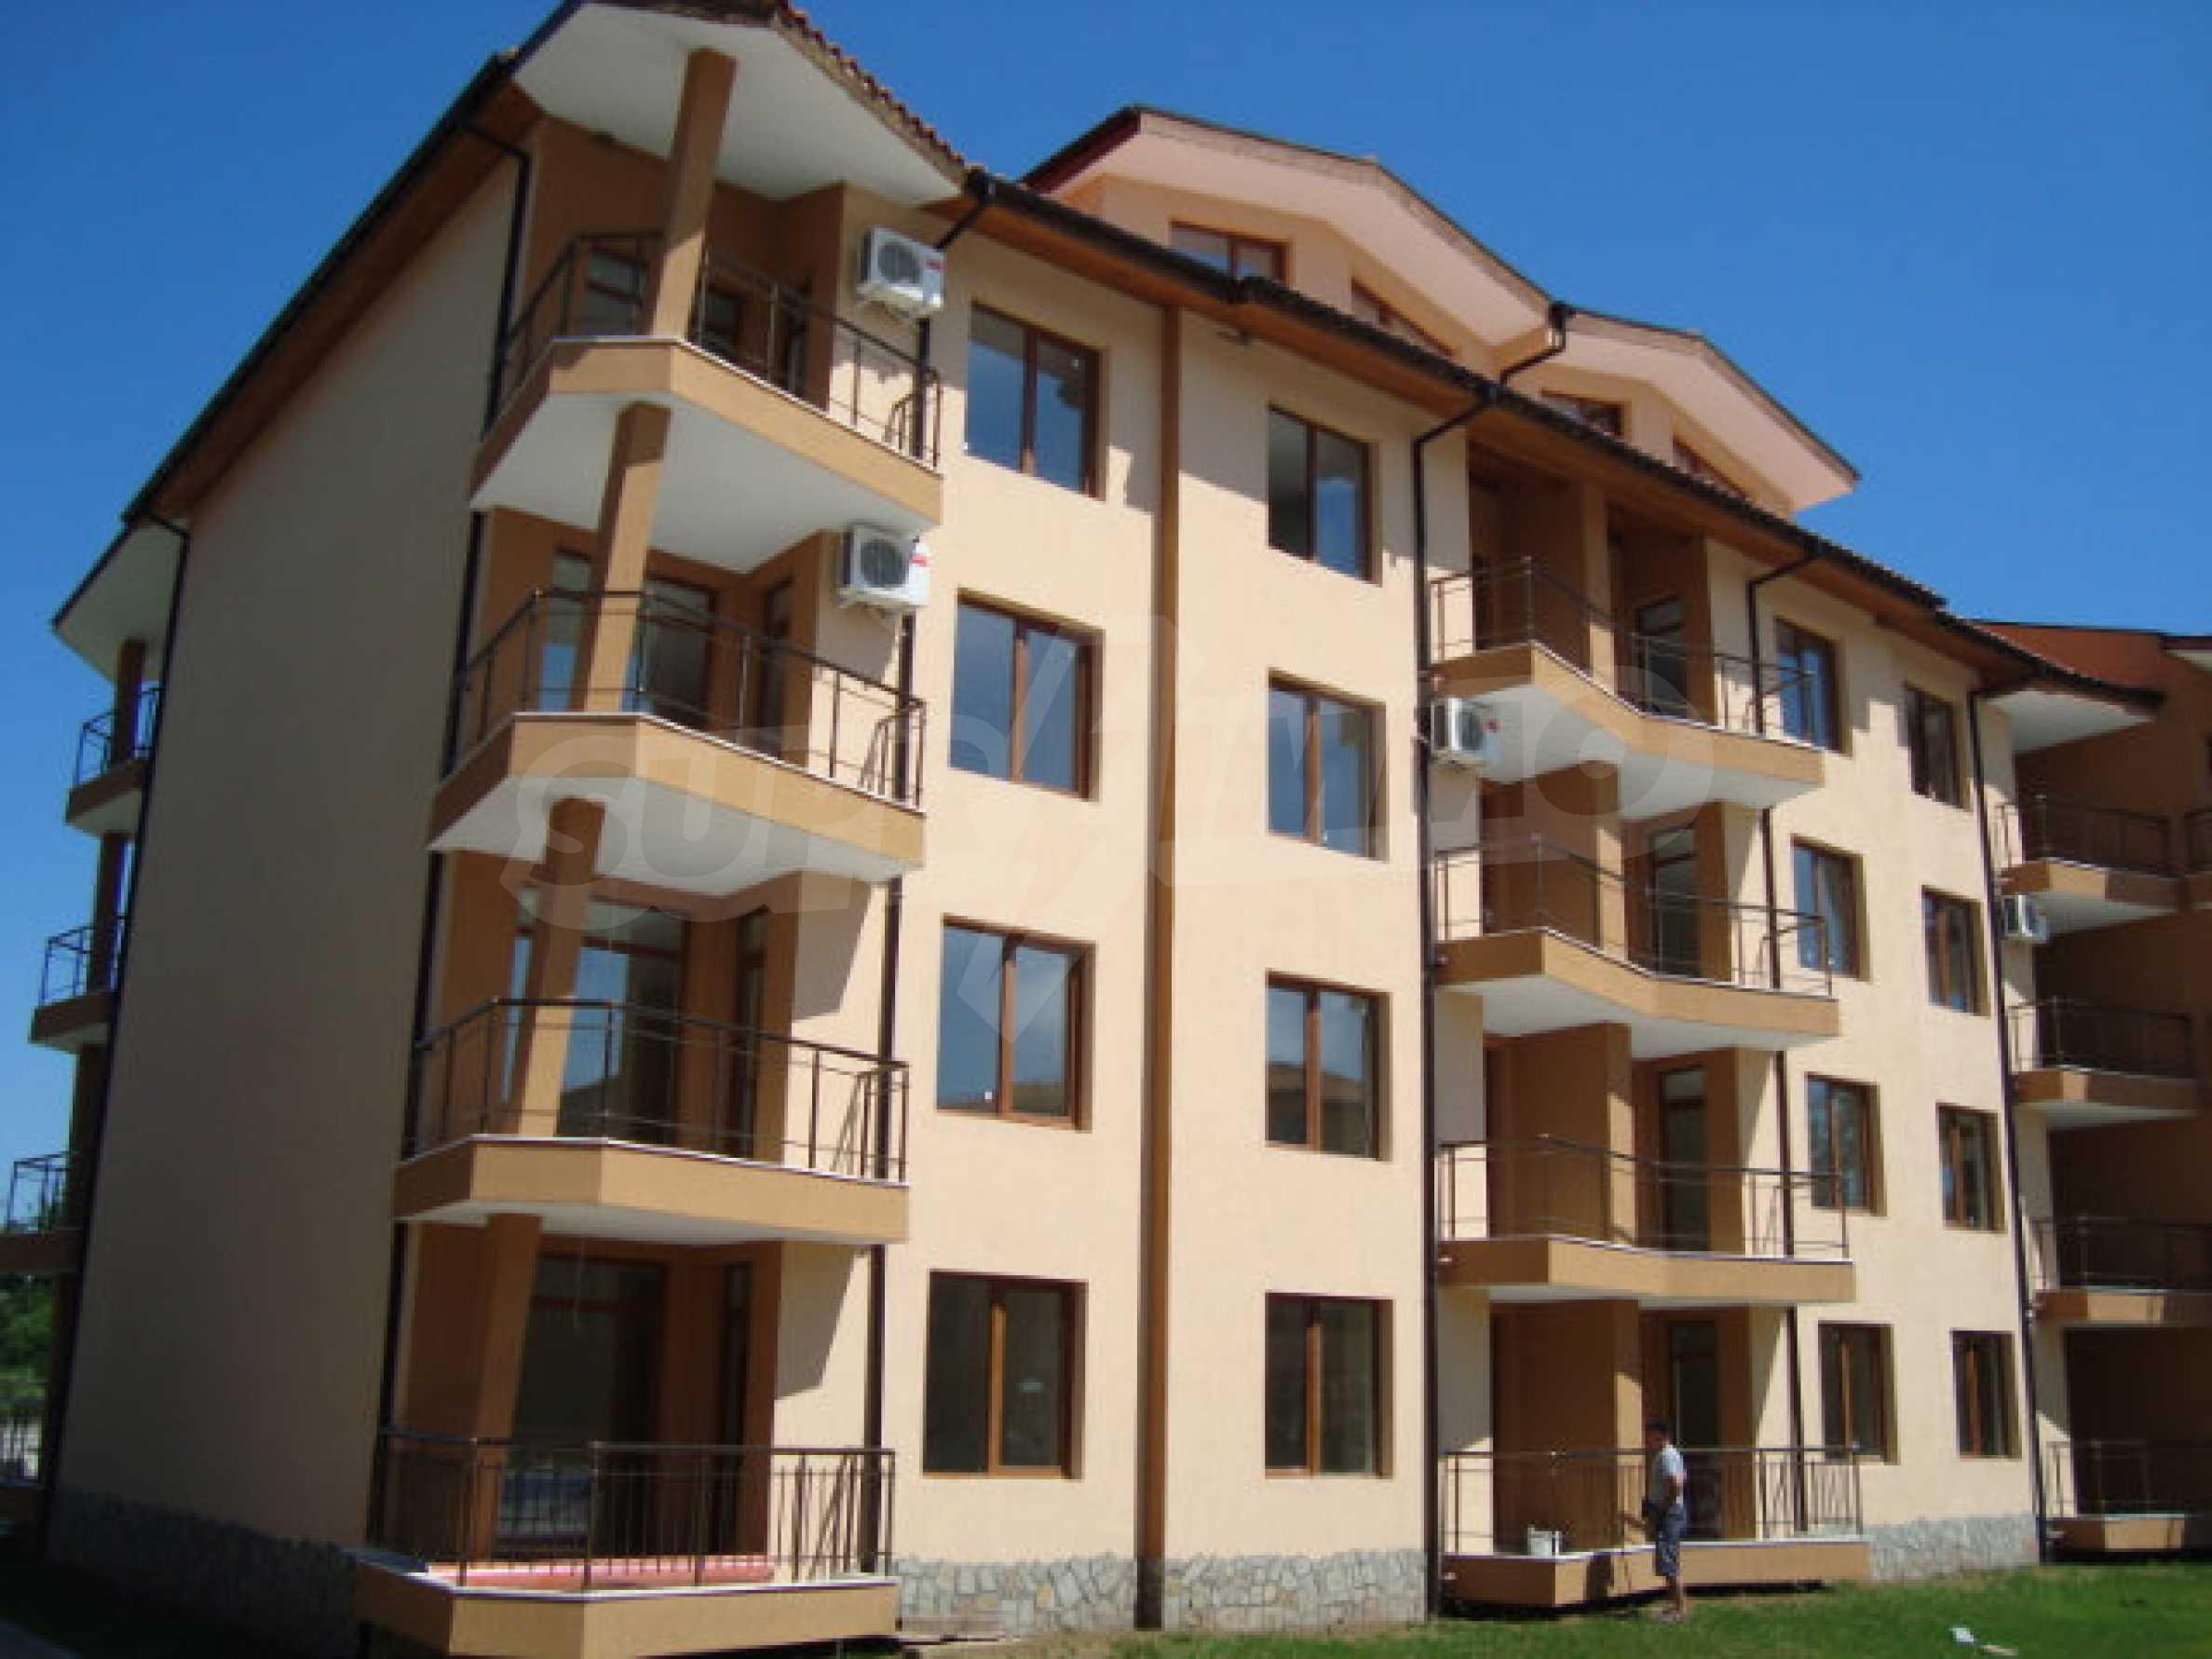 Studios und Apartments im Nestinarka-Komplex in Tsarevo 15